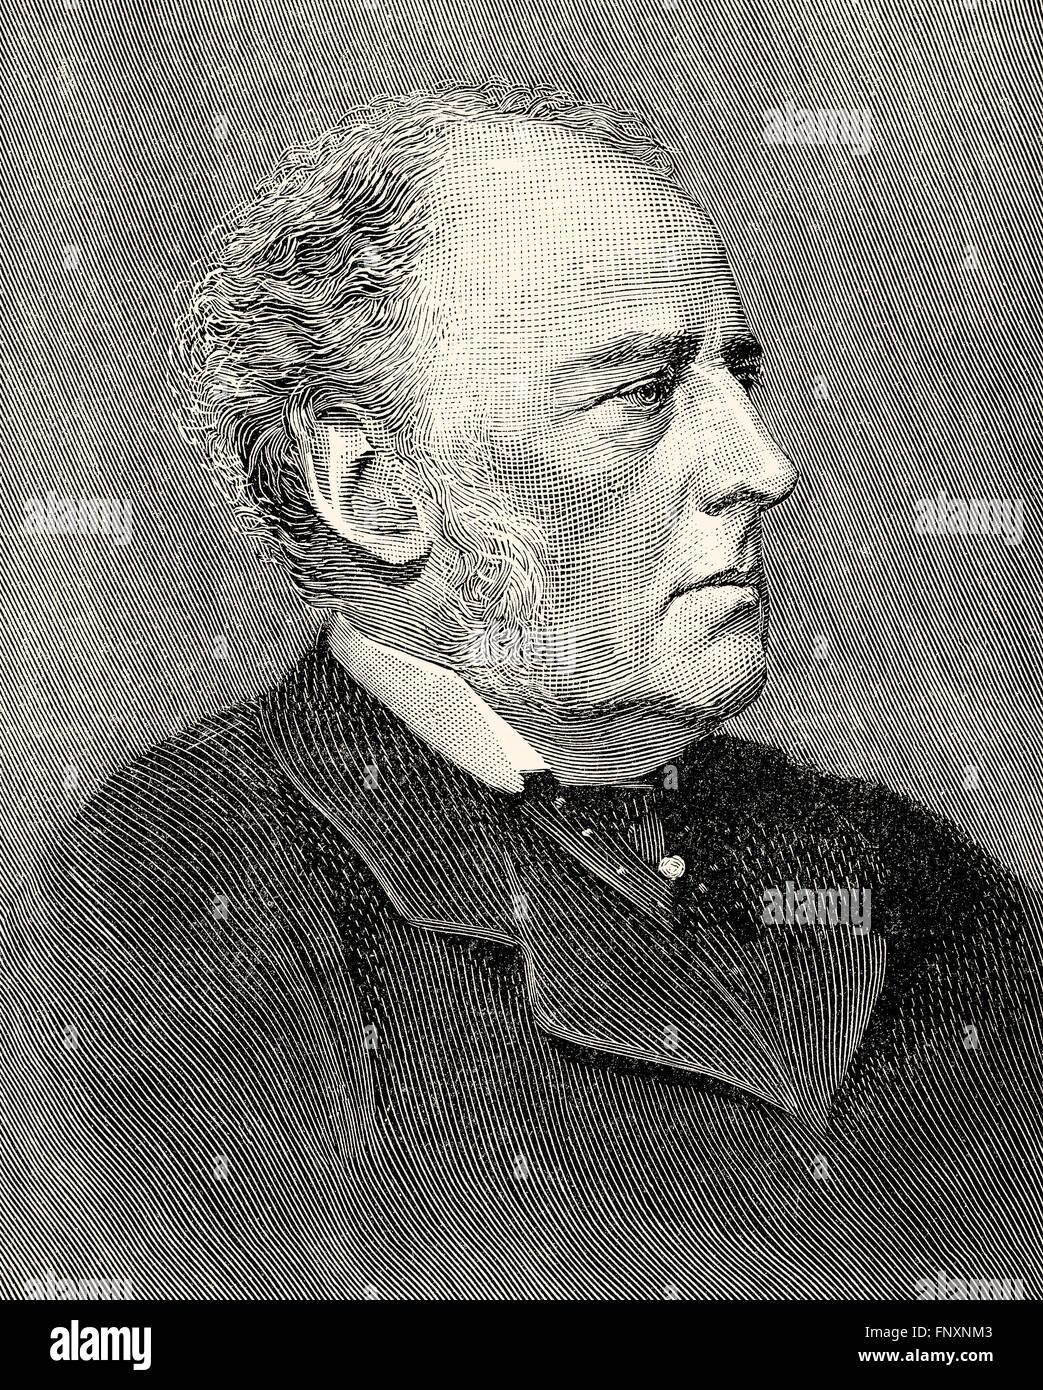 Sir John Everett Millais, 1st Baronet, 1829-1896, an English painter and illustrator Stock Photo